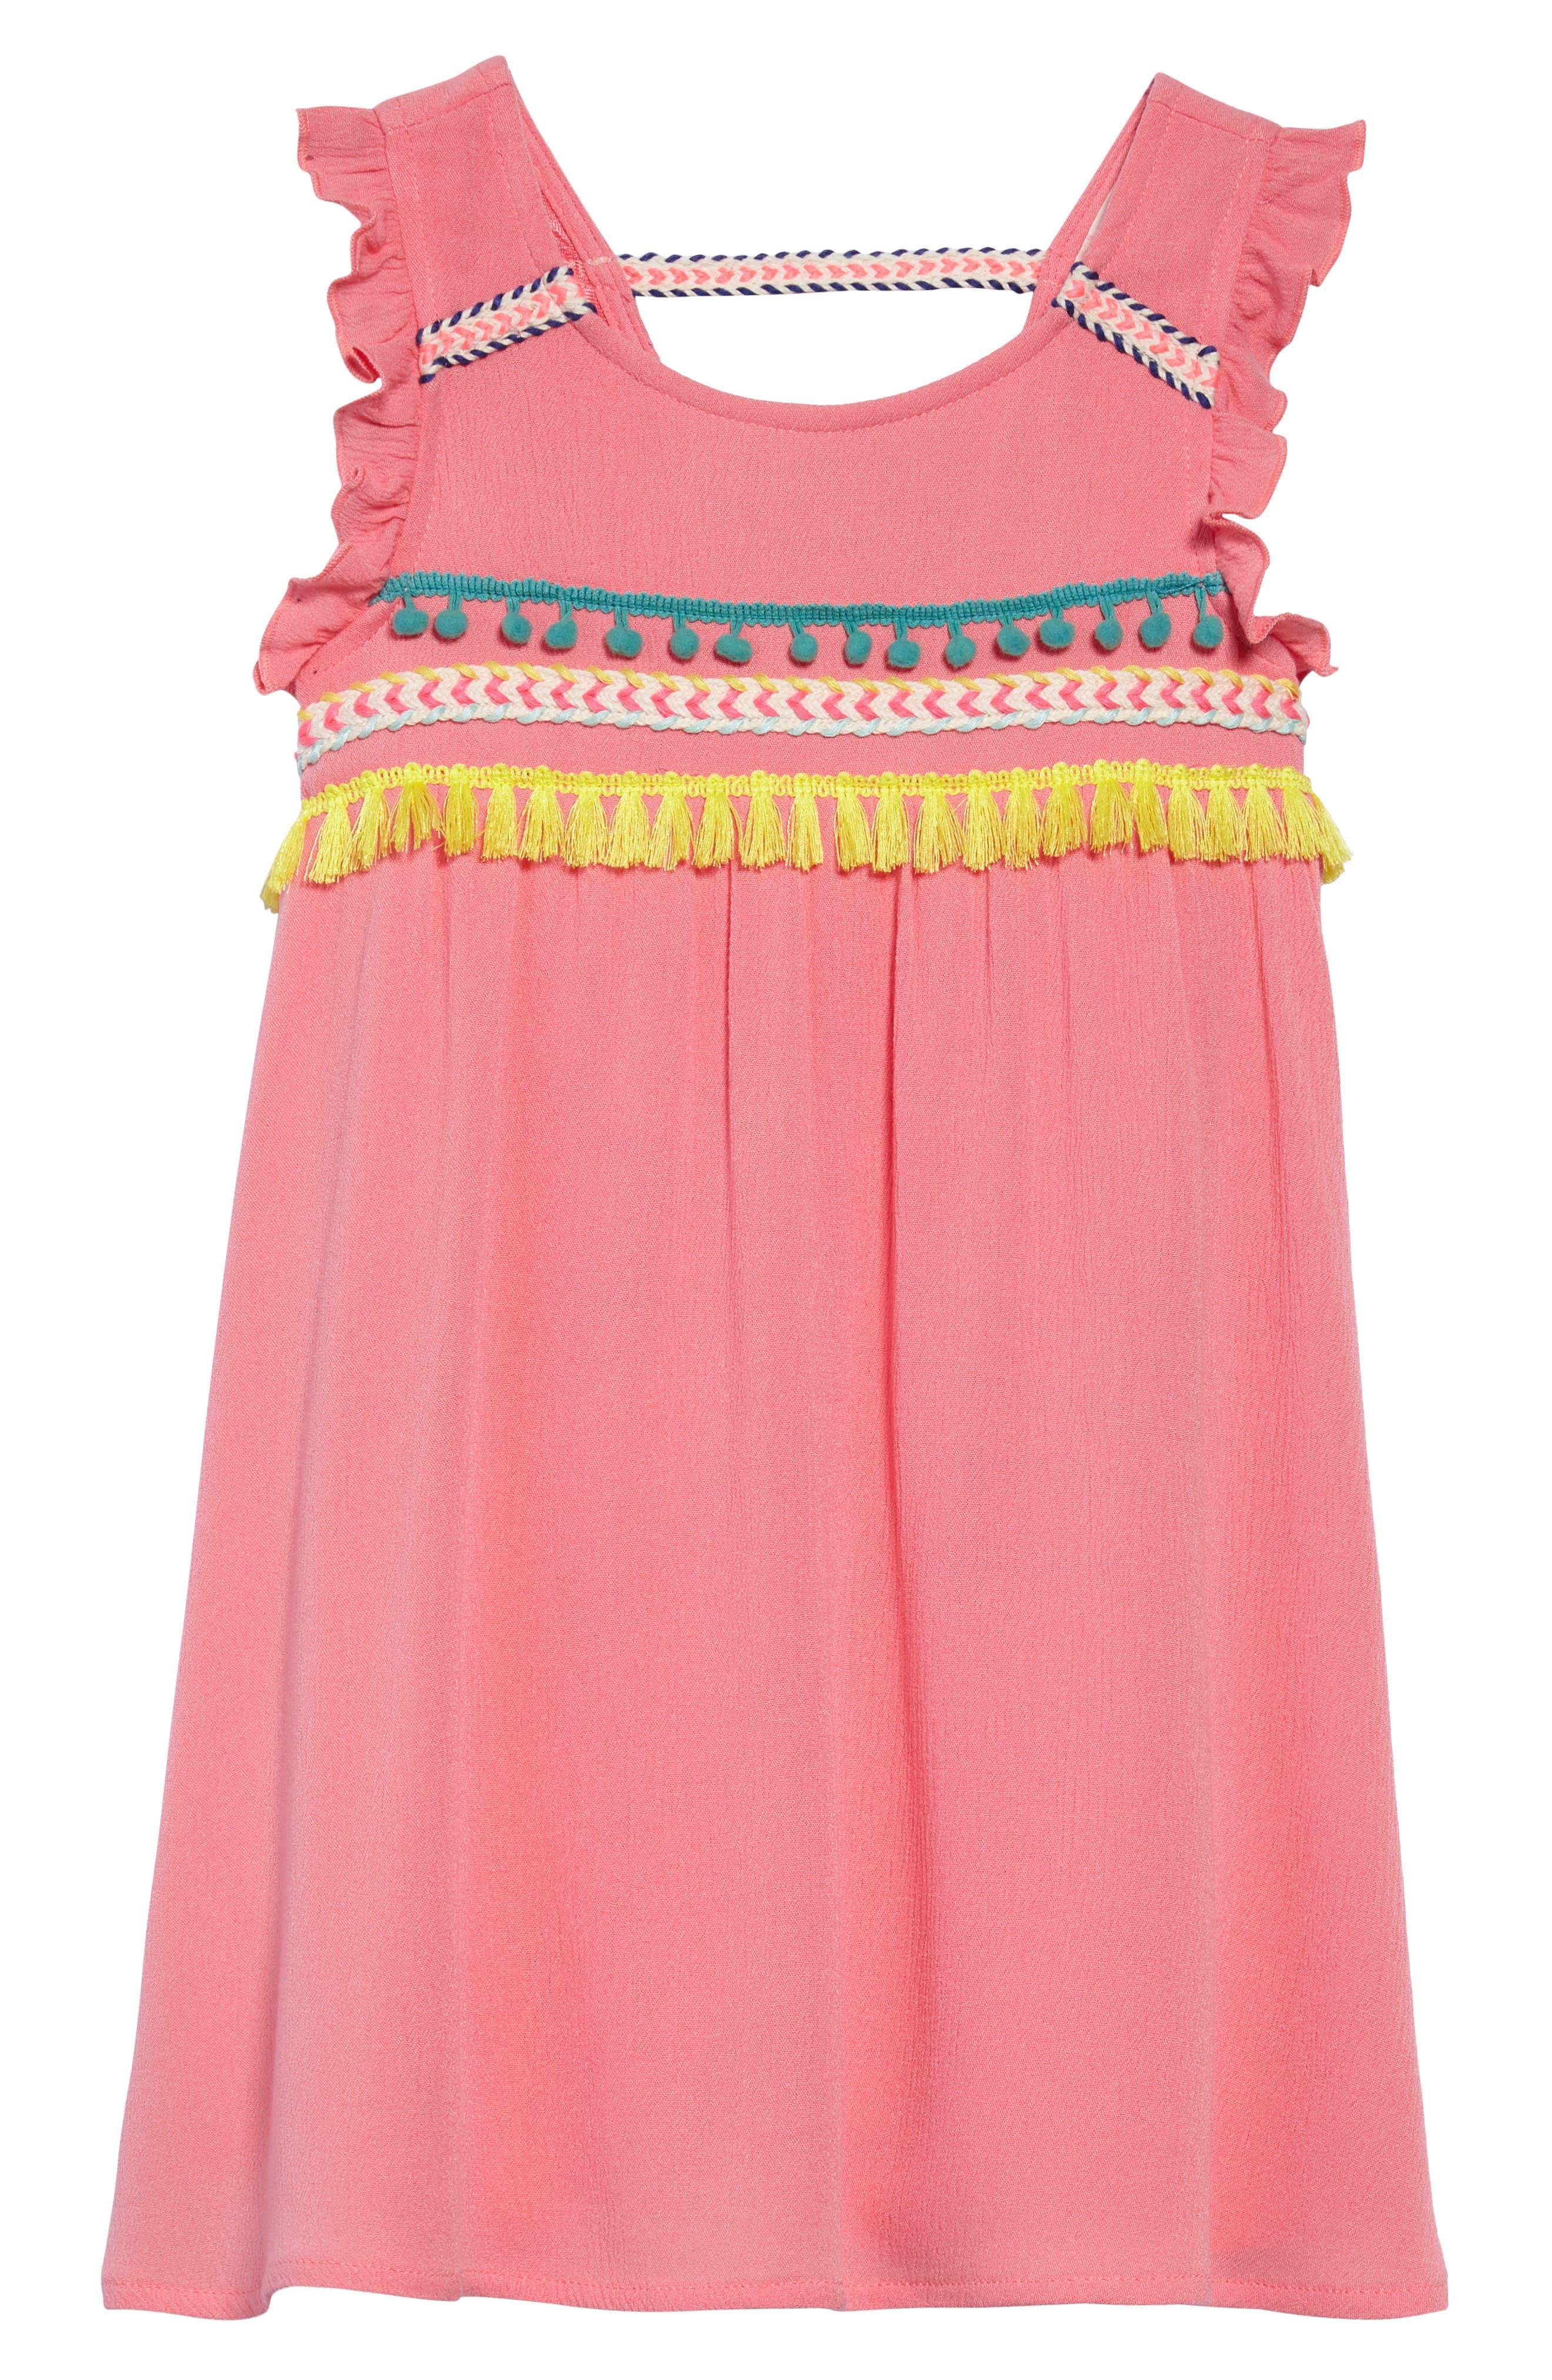 Trim Babydoll Dress,                             Main thumbnail 1, color,                             951